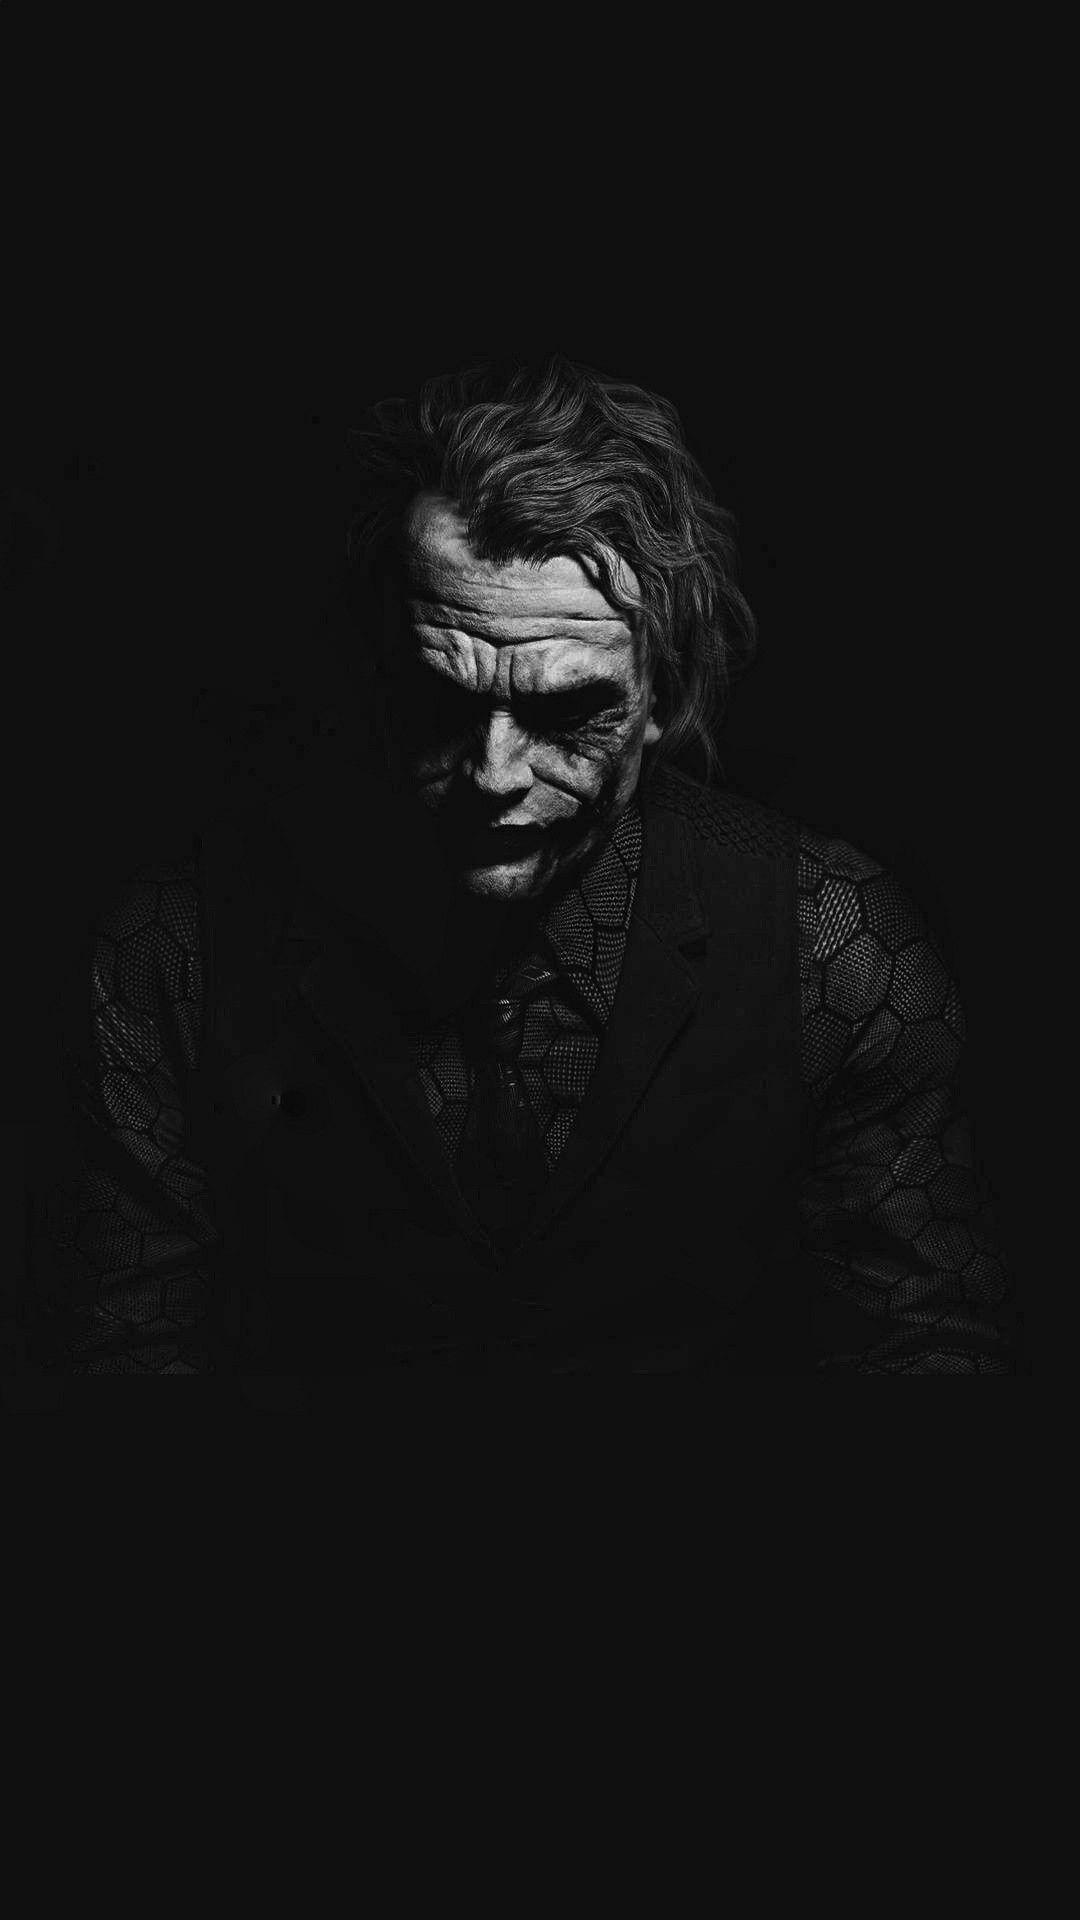 Dark Wallpaper Hupages Download Iphone Wallpapers Batman Joker Wallpaper Joker Iphone Wallpaper Joker Pics